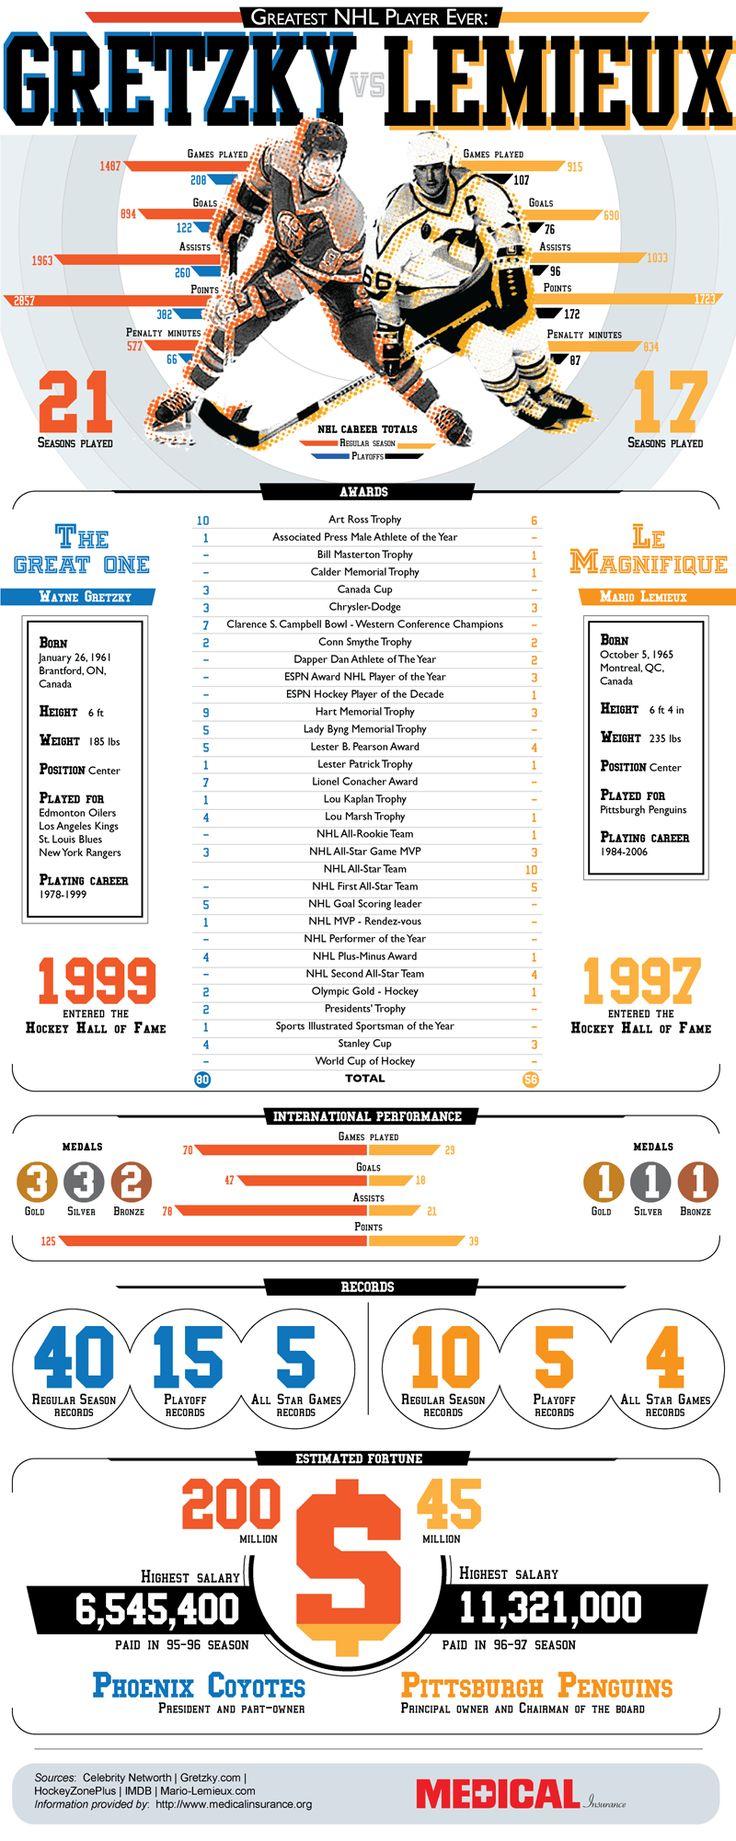 Greatest NHL Player Ever: Wayne Gretzky vs. Mario Lemieux (Infographic